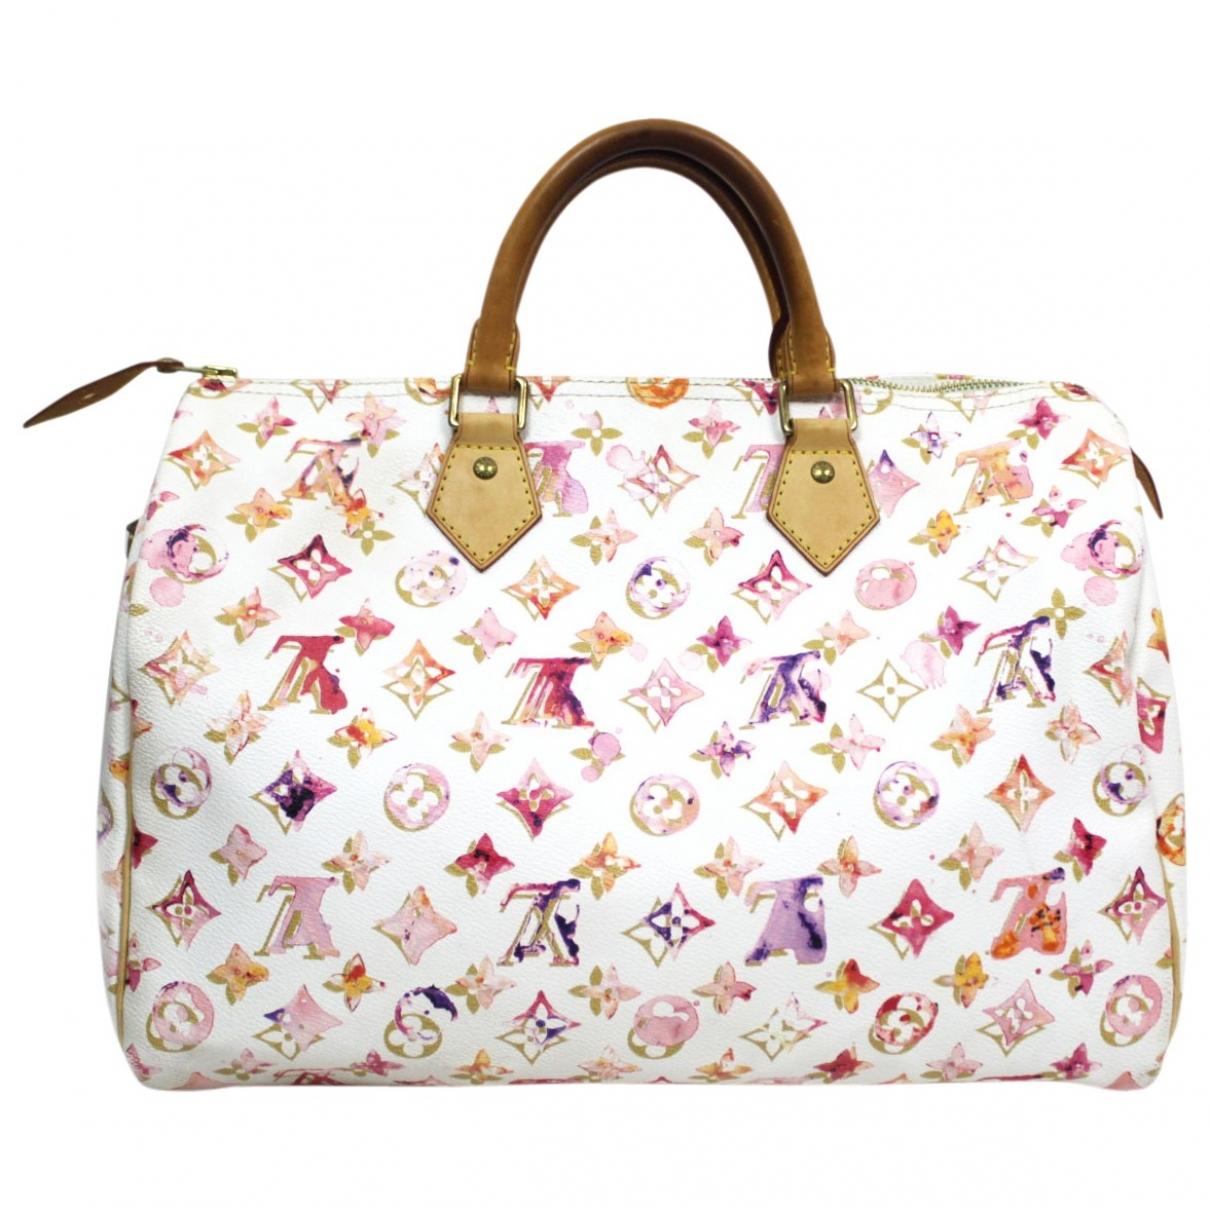 Louis Vuitton - Sac a main Speedy pour femme en toile - blanc